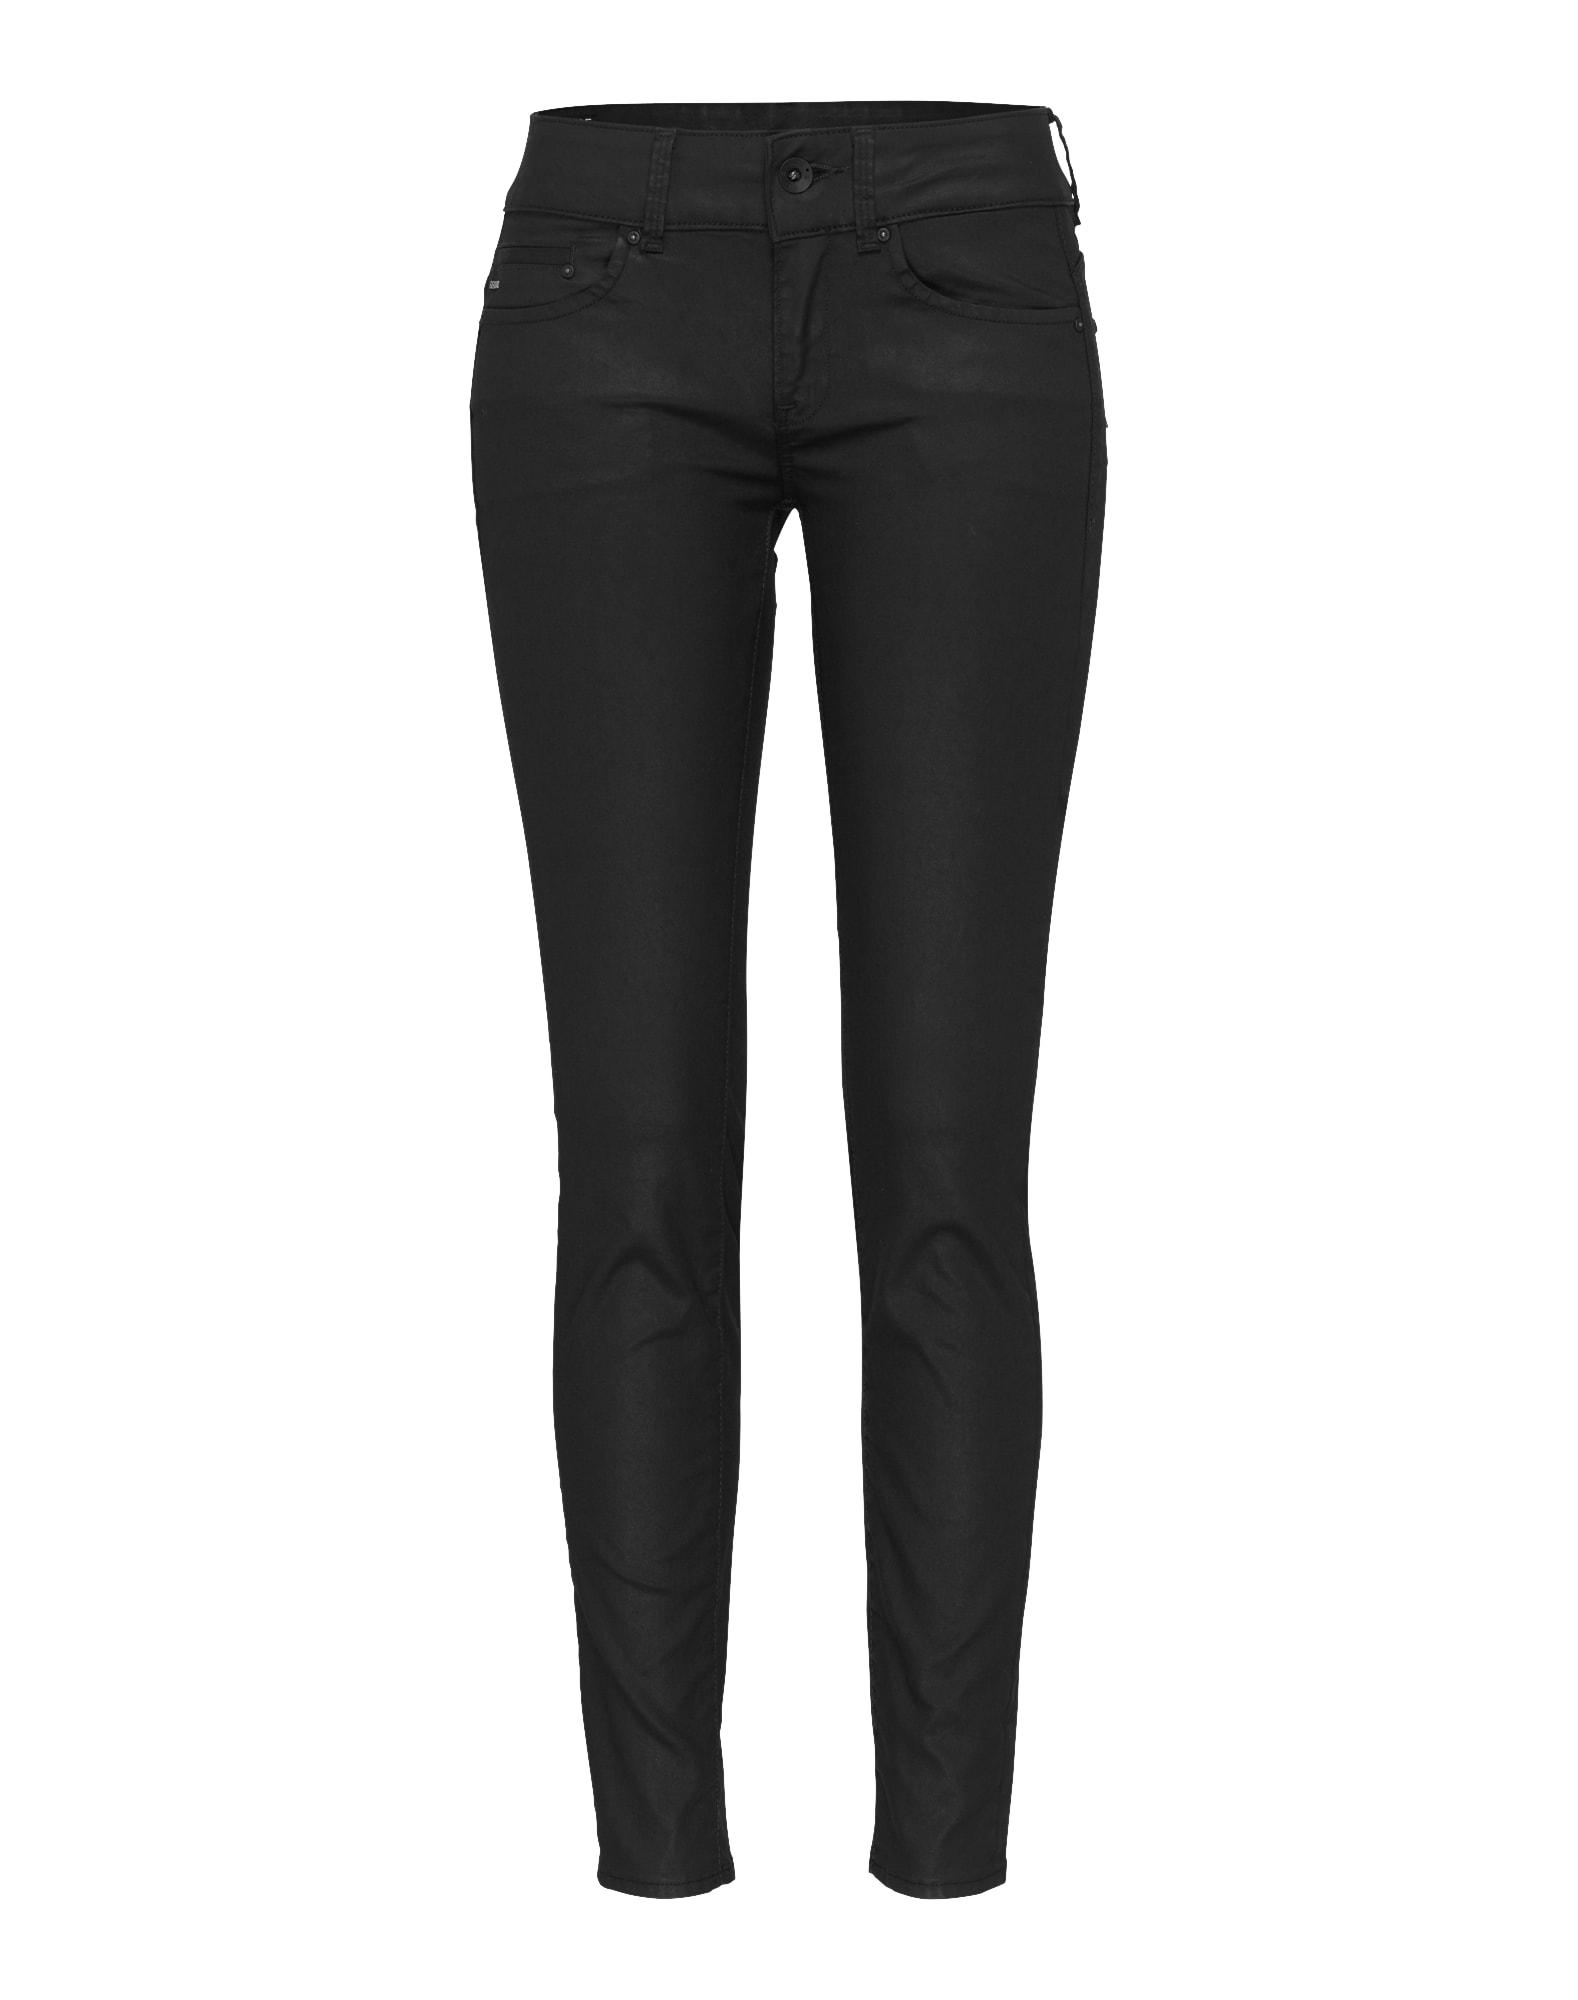 G-STAR RAW Dames Jeans Midge Cody black denim